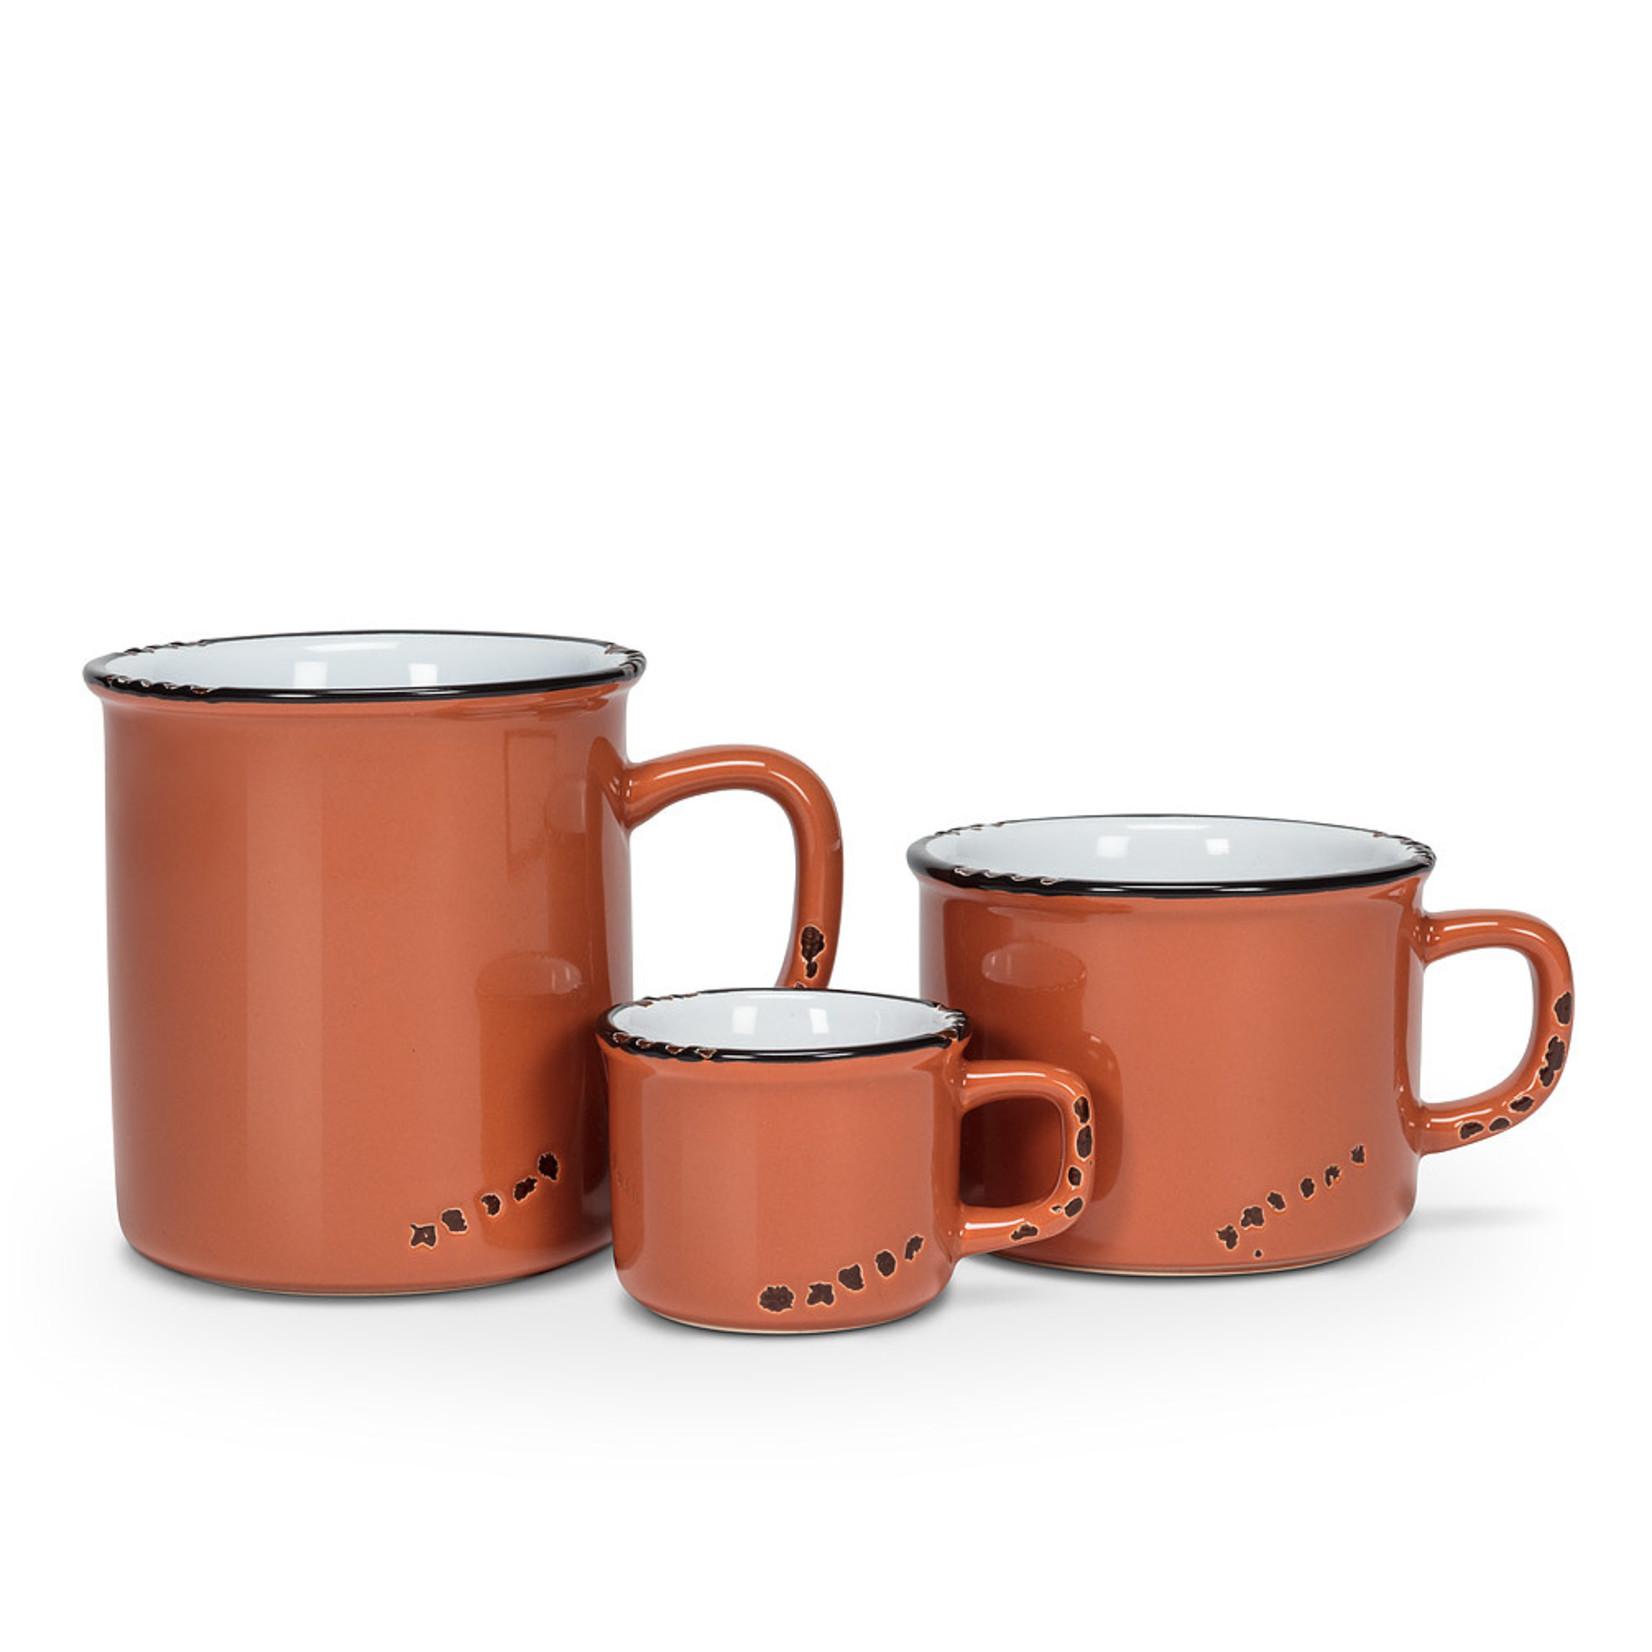 Abbott Tasse cappuccino émail - Terracotta